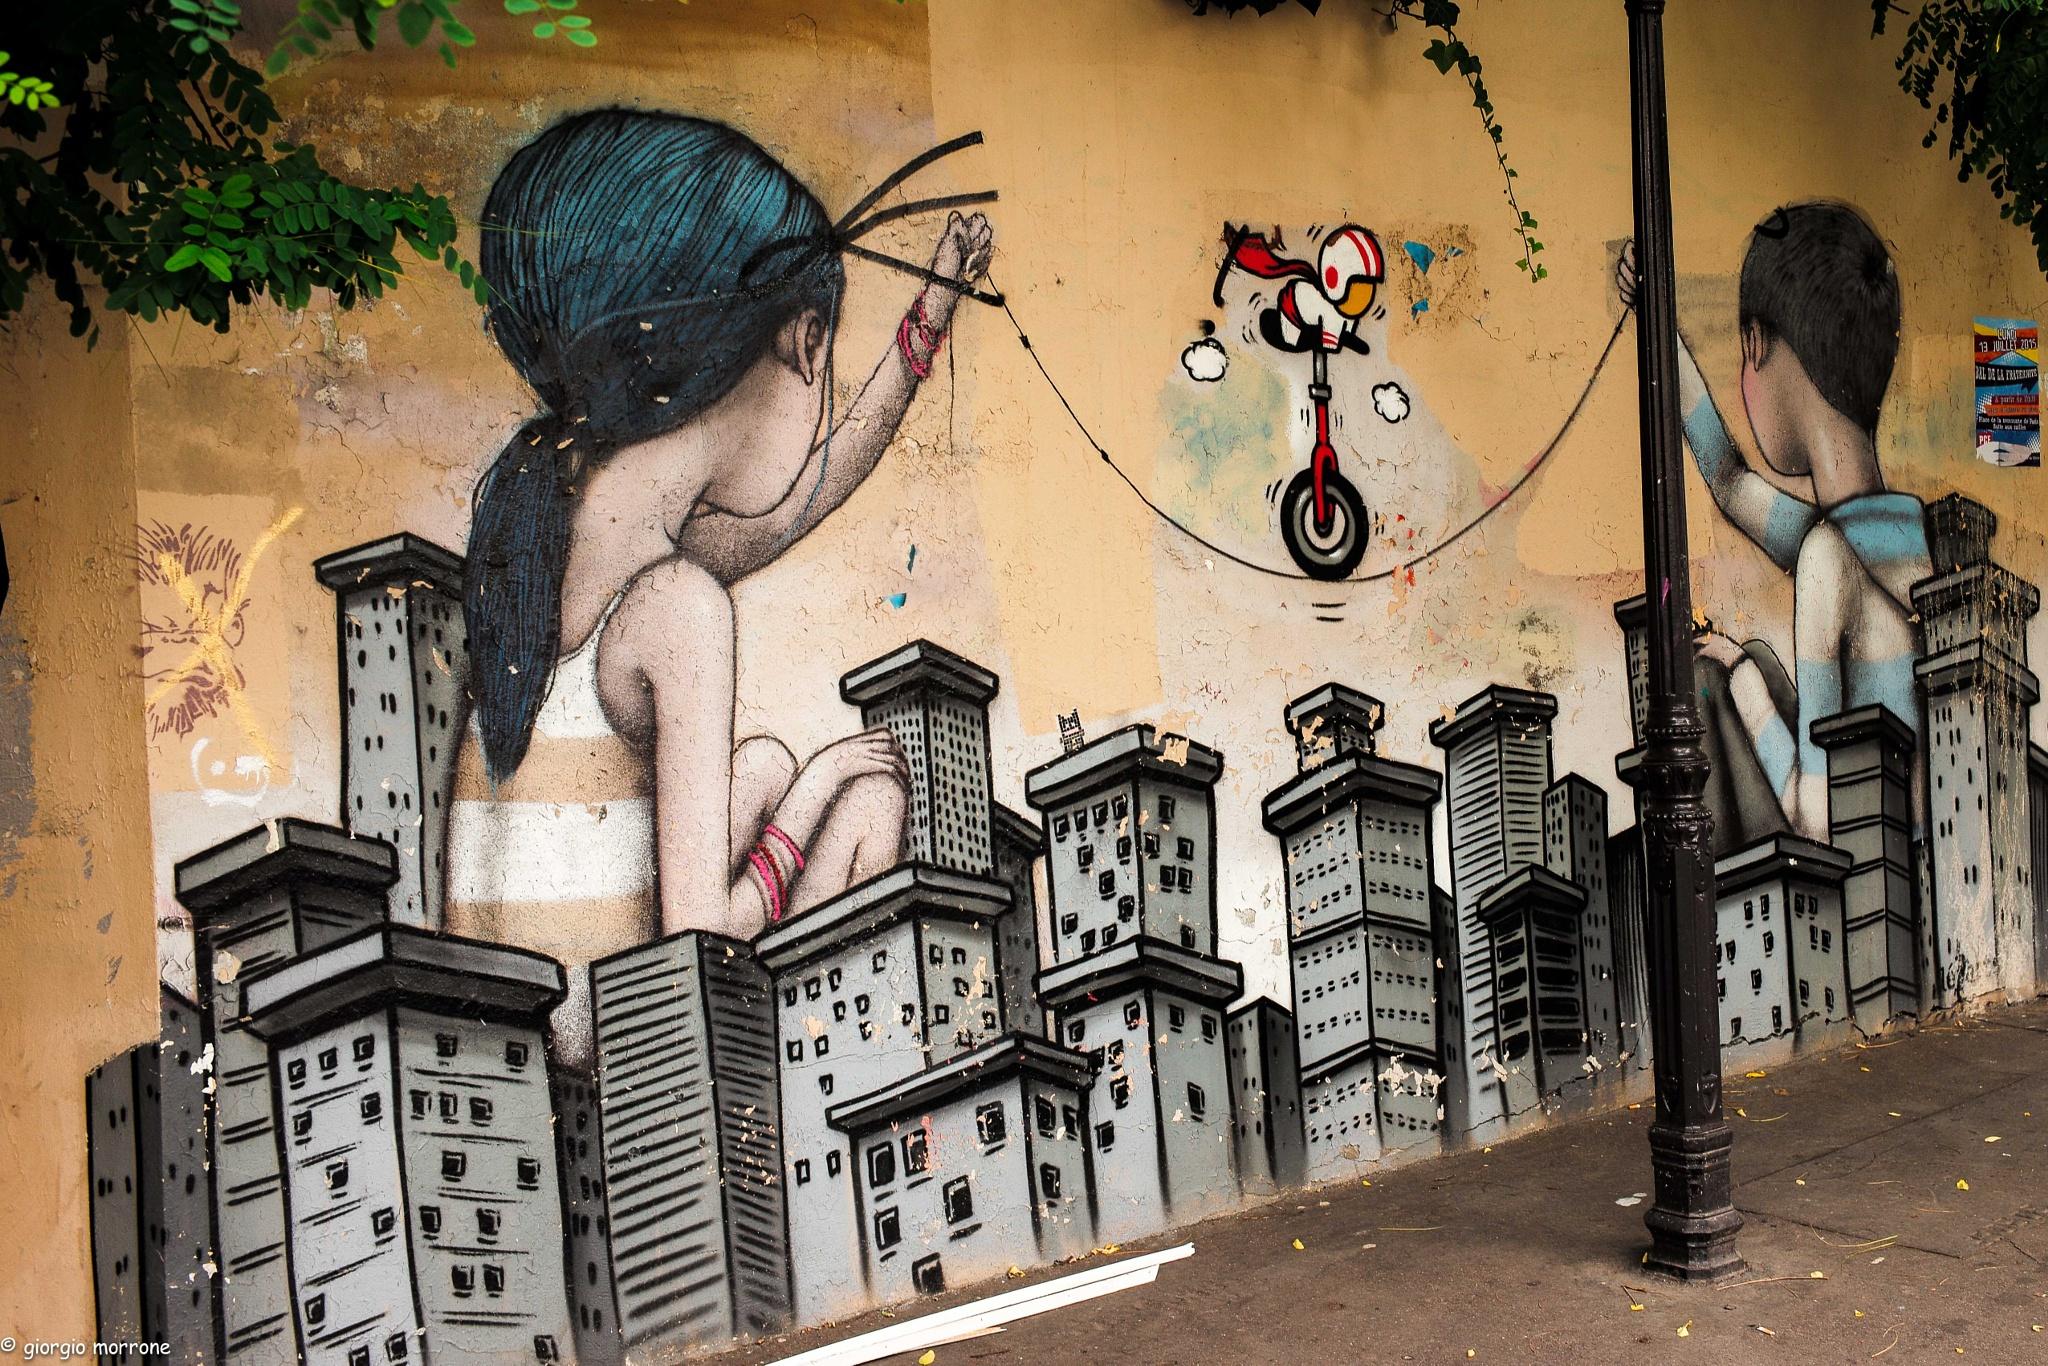 street art #3 by giorgiomorrone